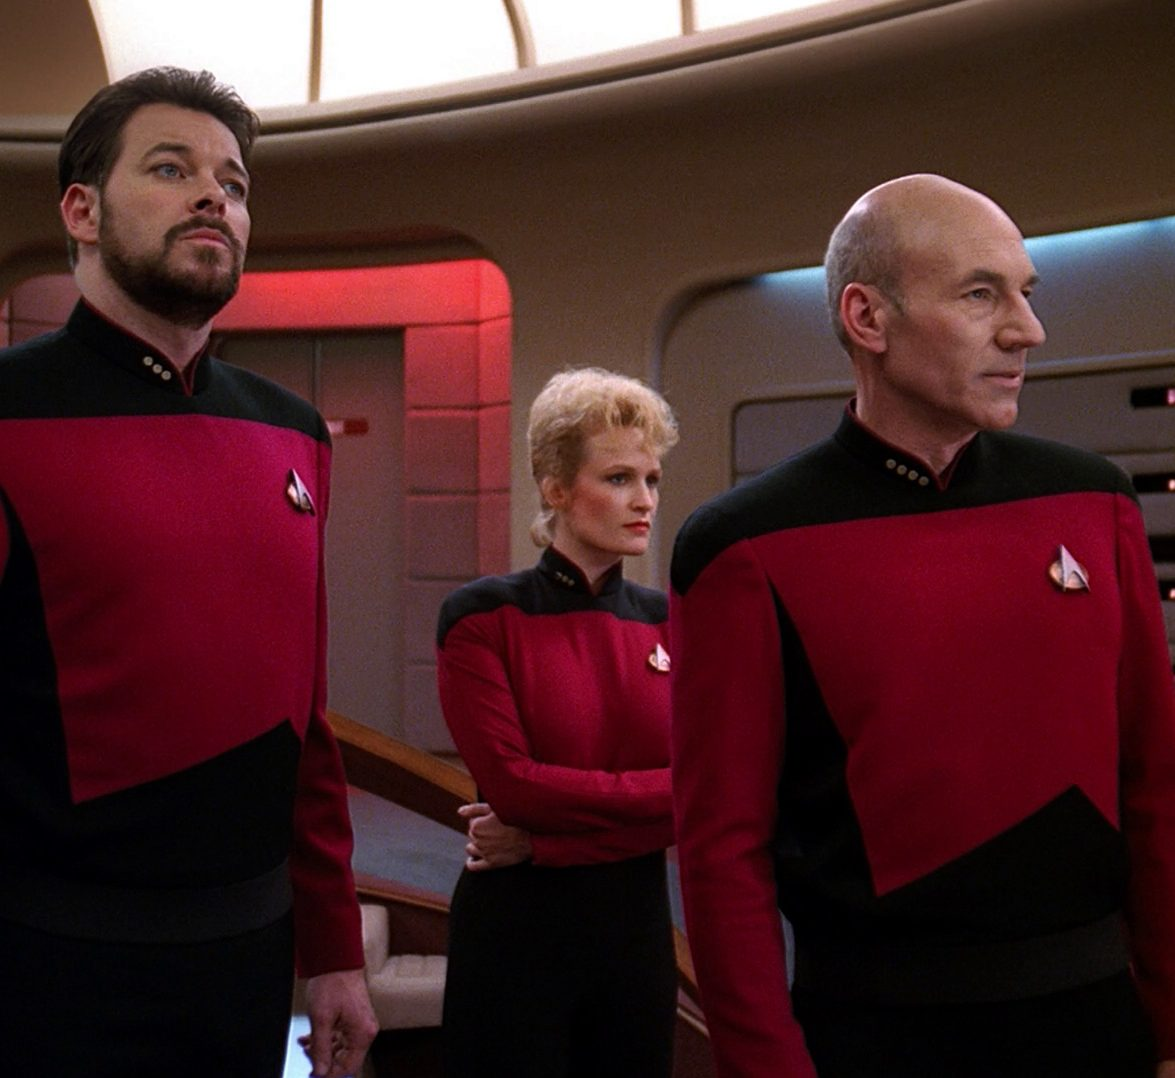 1 29 e1615292694619 30 Intergalactic Facts About Star Trek: The Next Generation